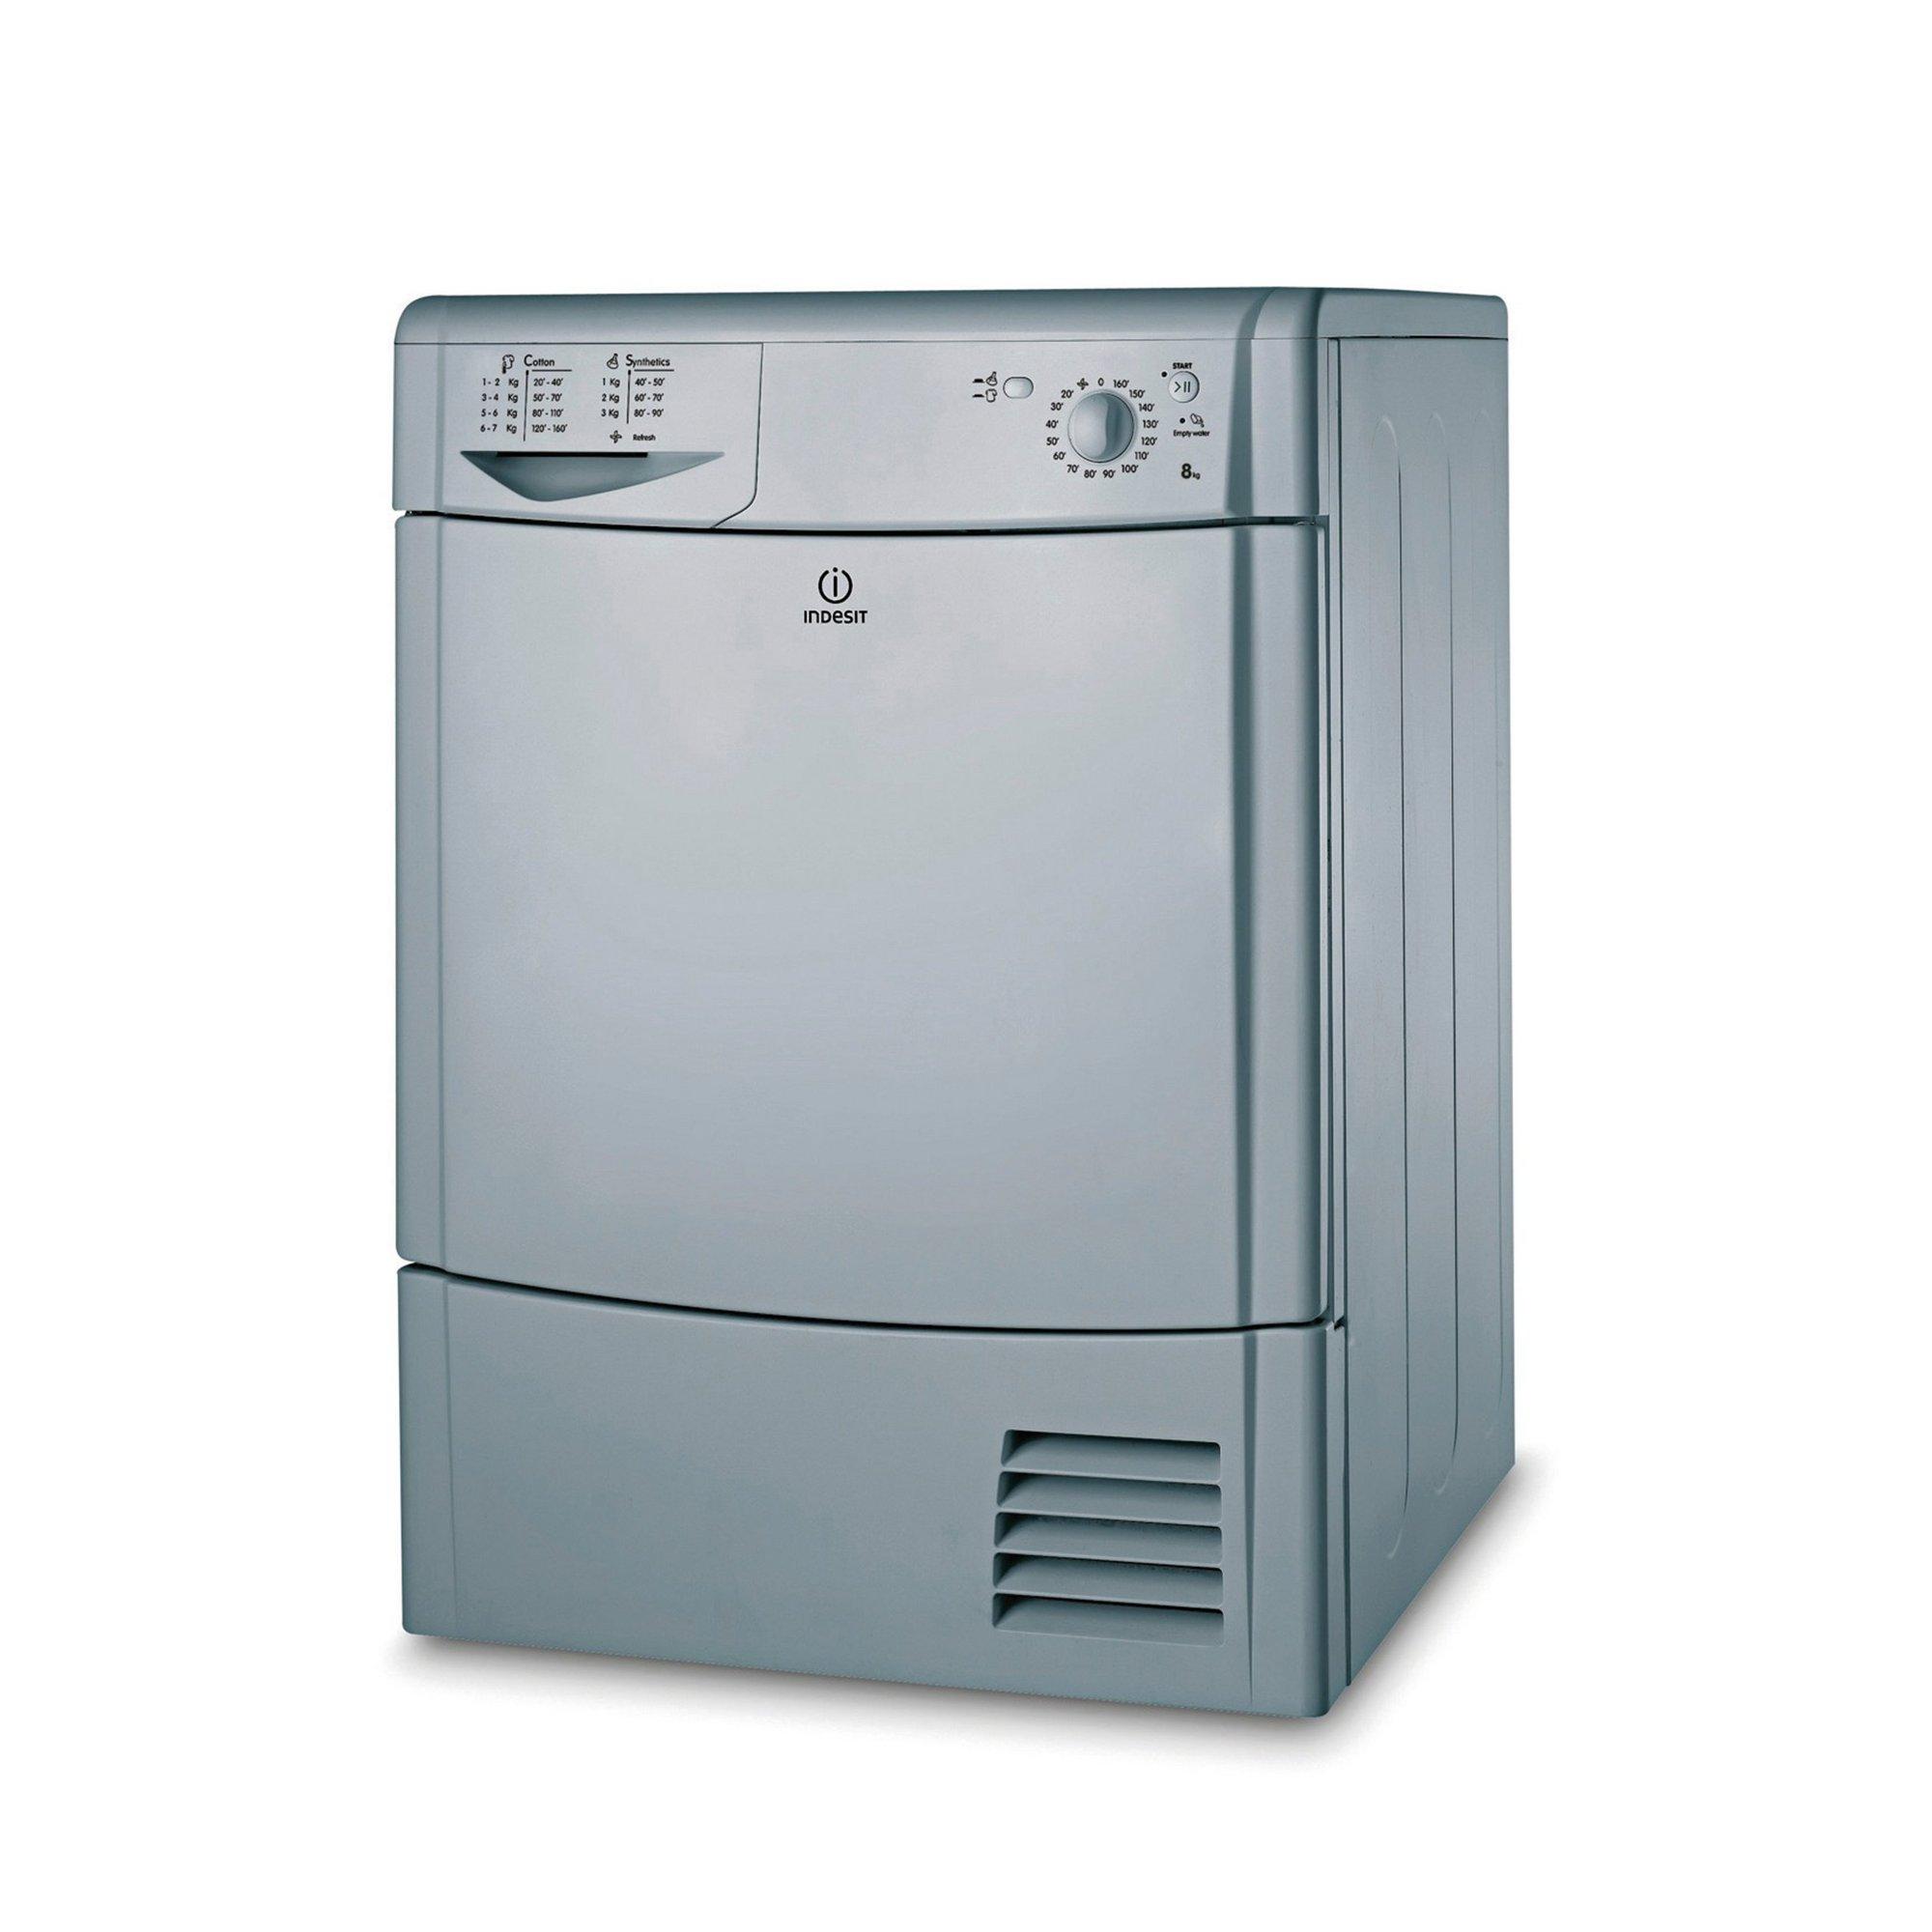 Image of Indesit 8kg Condenser Sensor Tumble Dryer